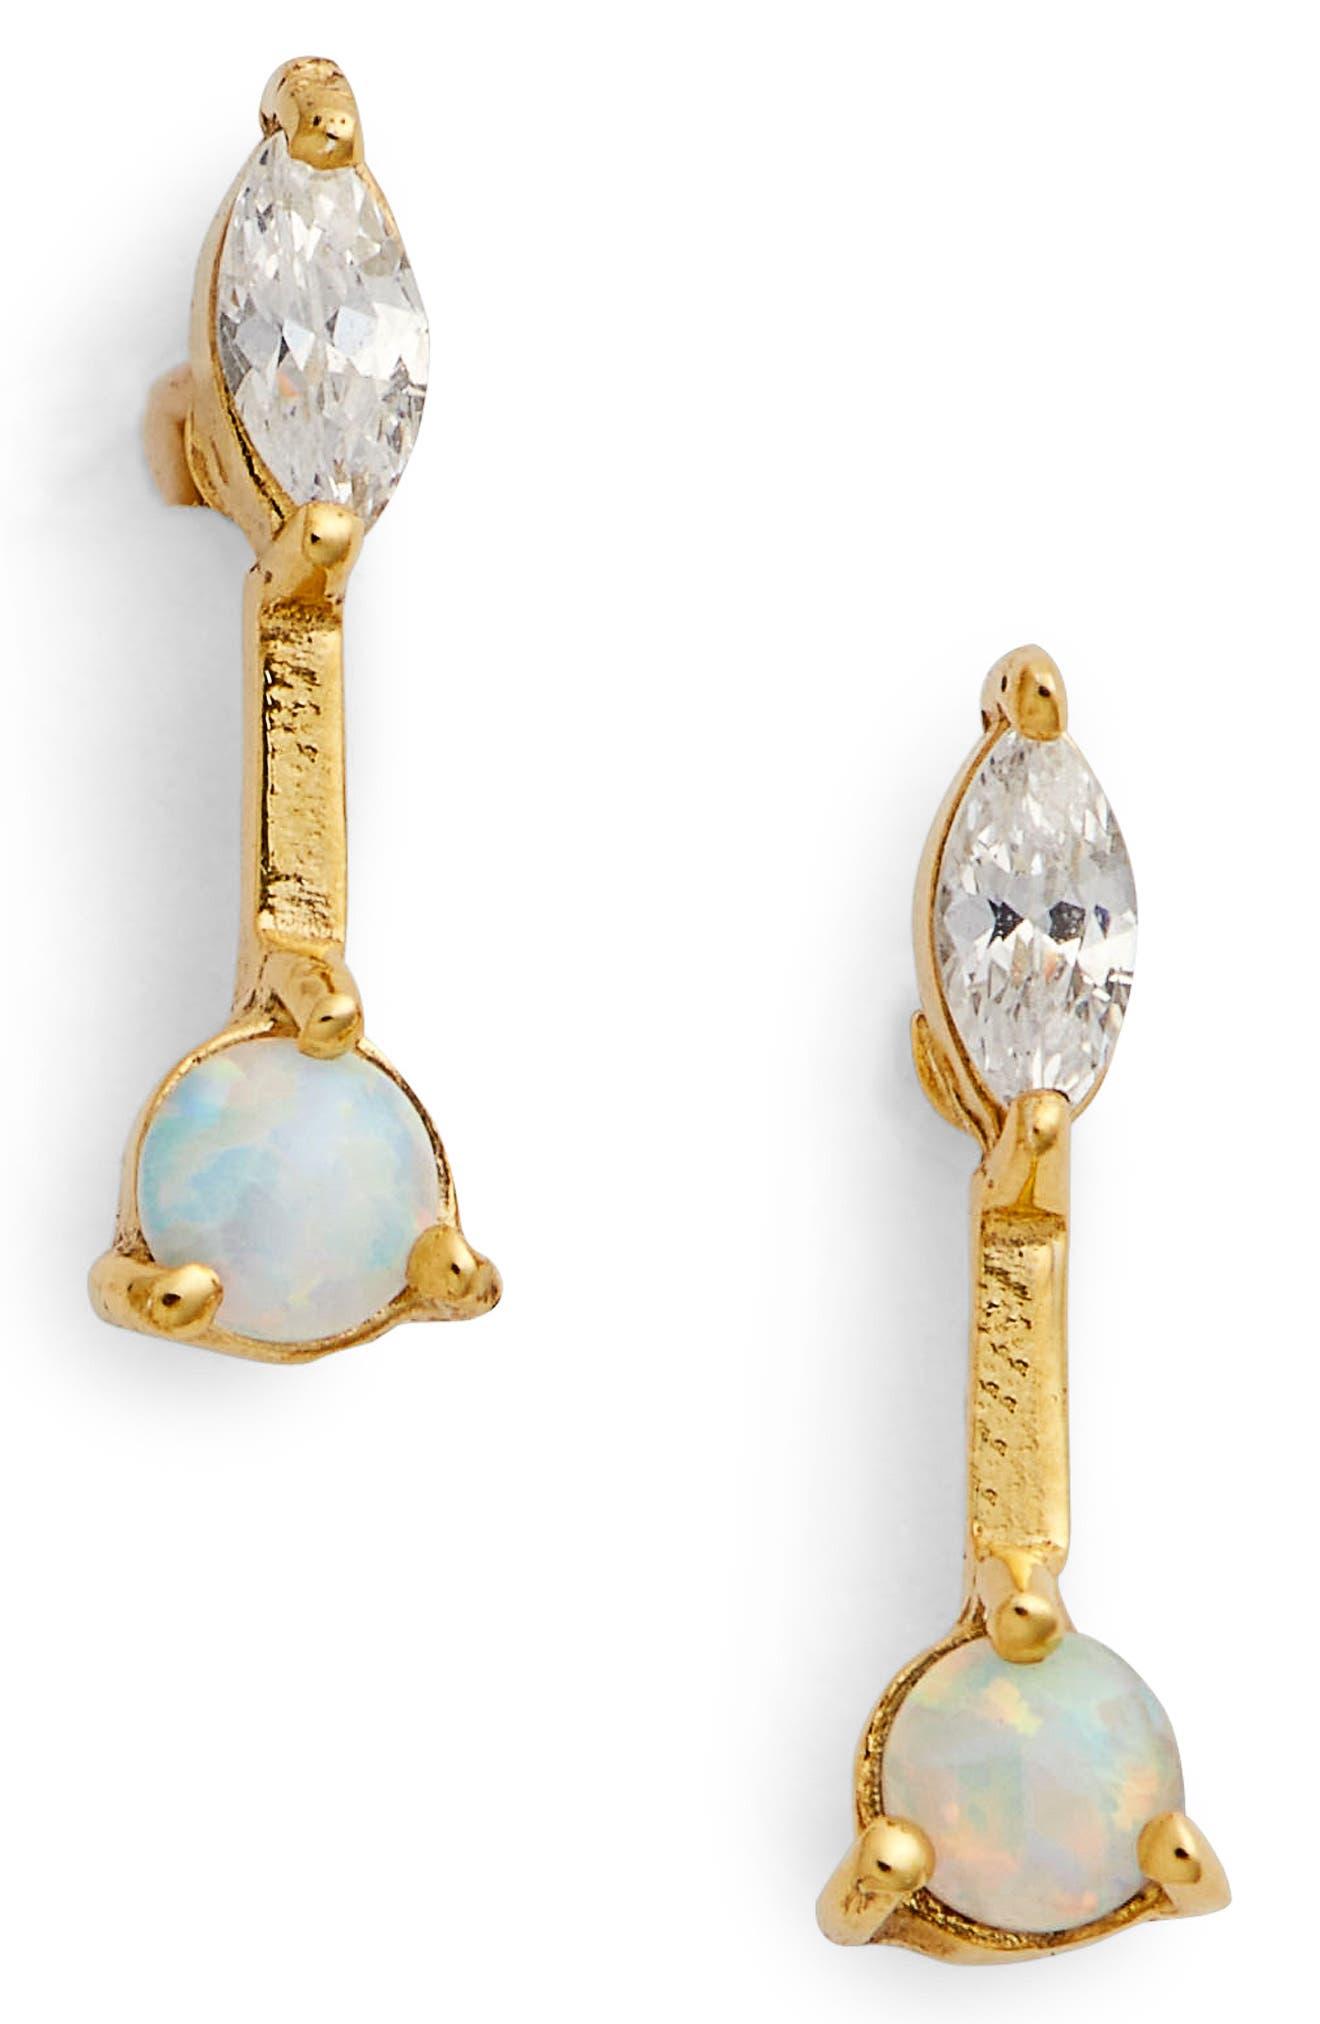 Sydney Linear Stud Earrings,                             Main thumbnail 1, color,                             Gold